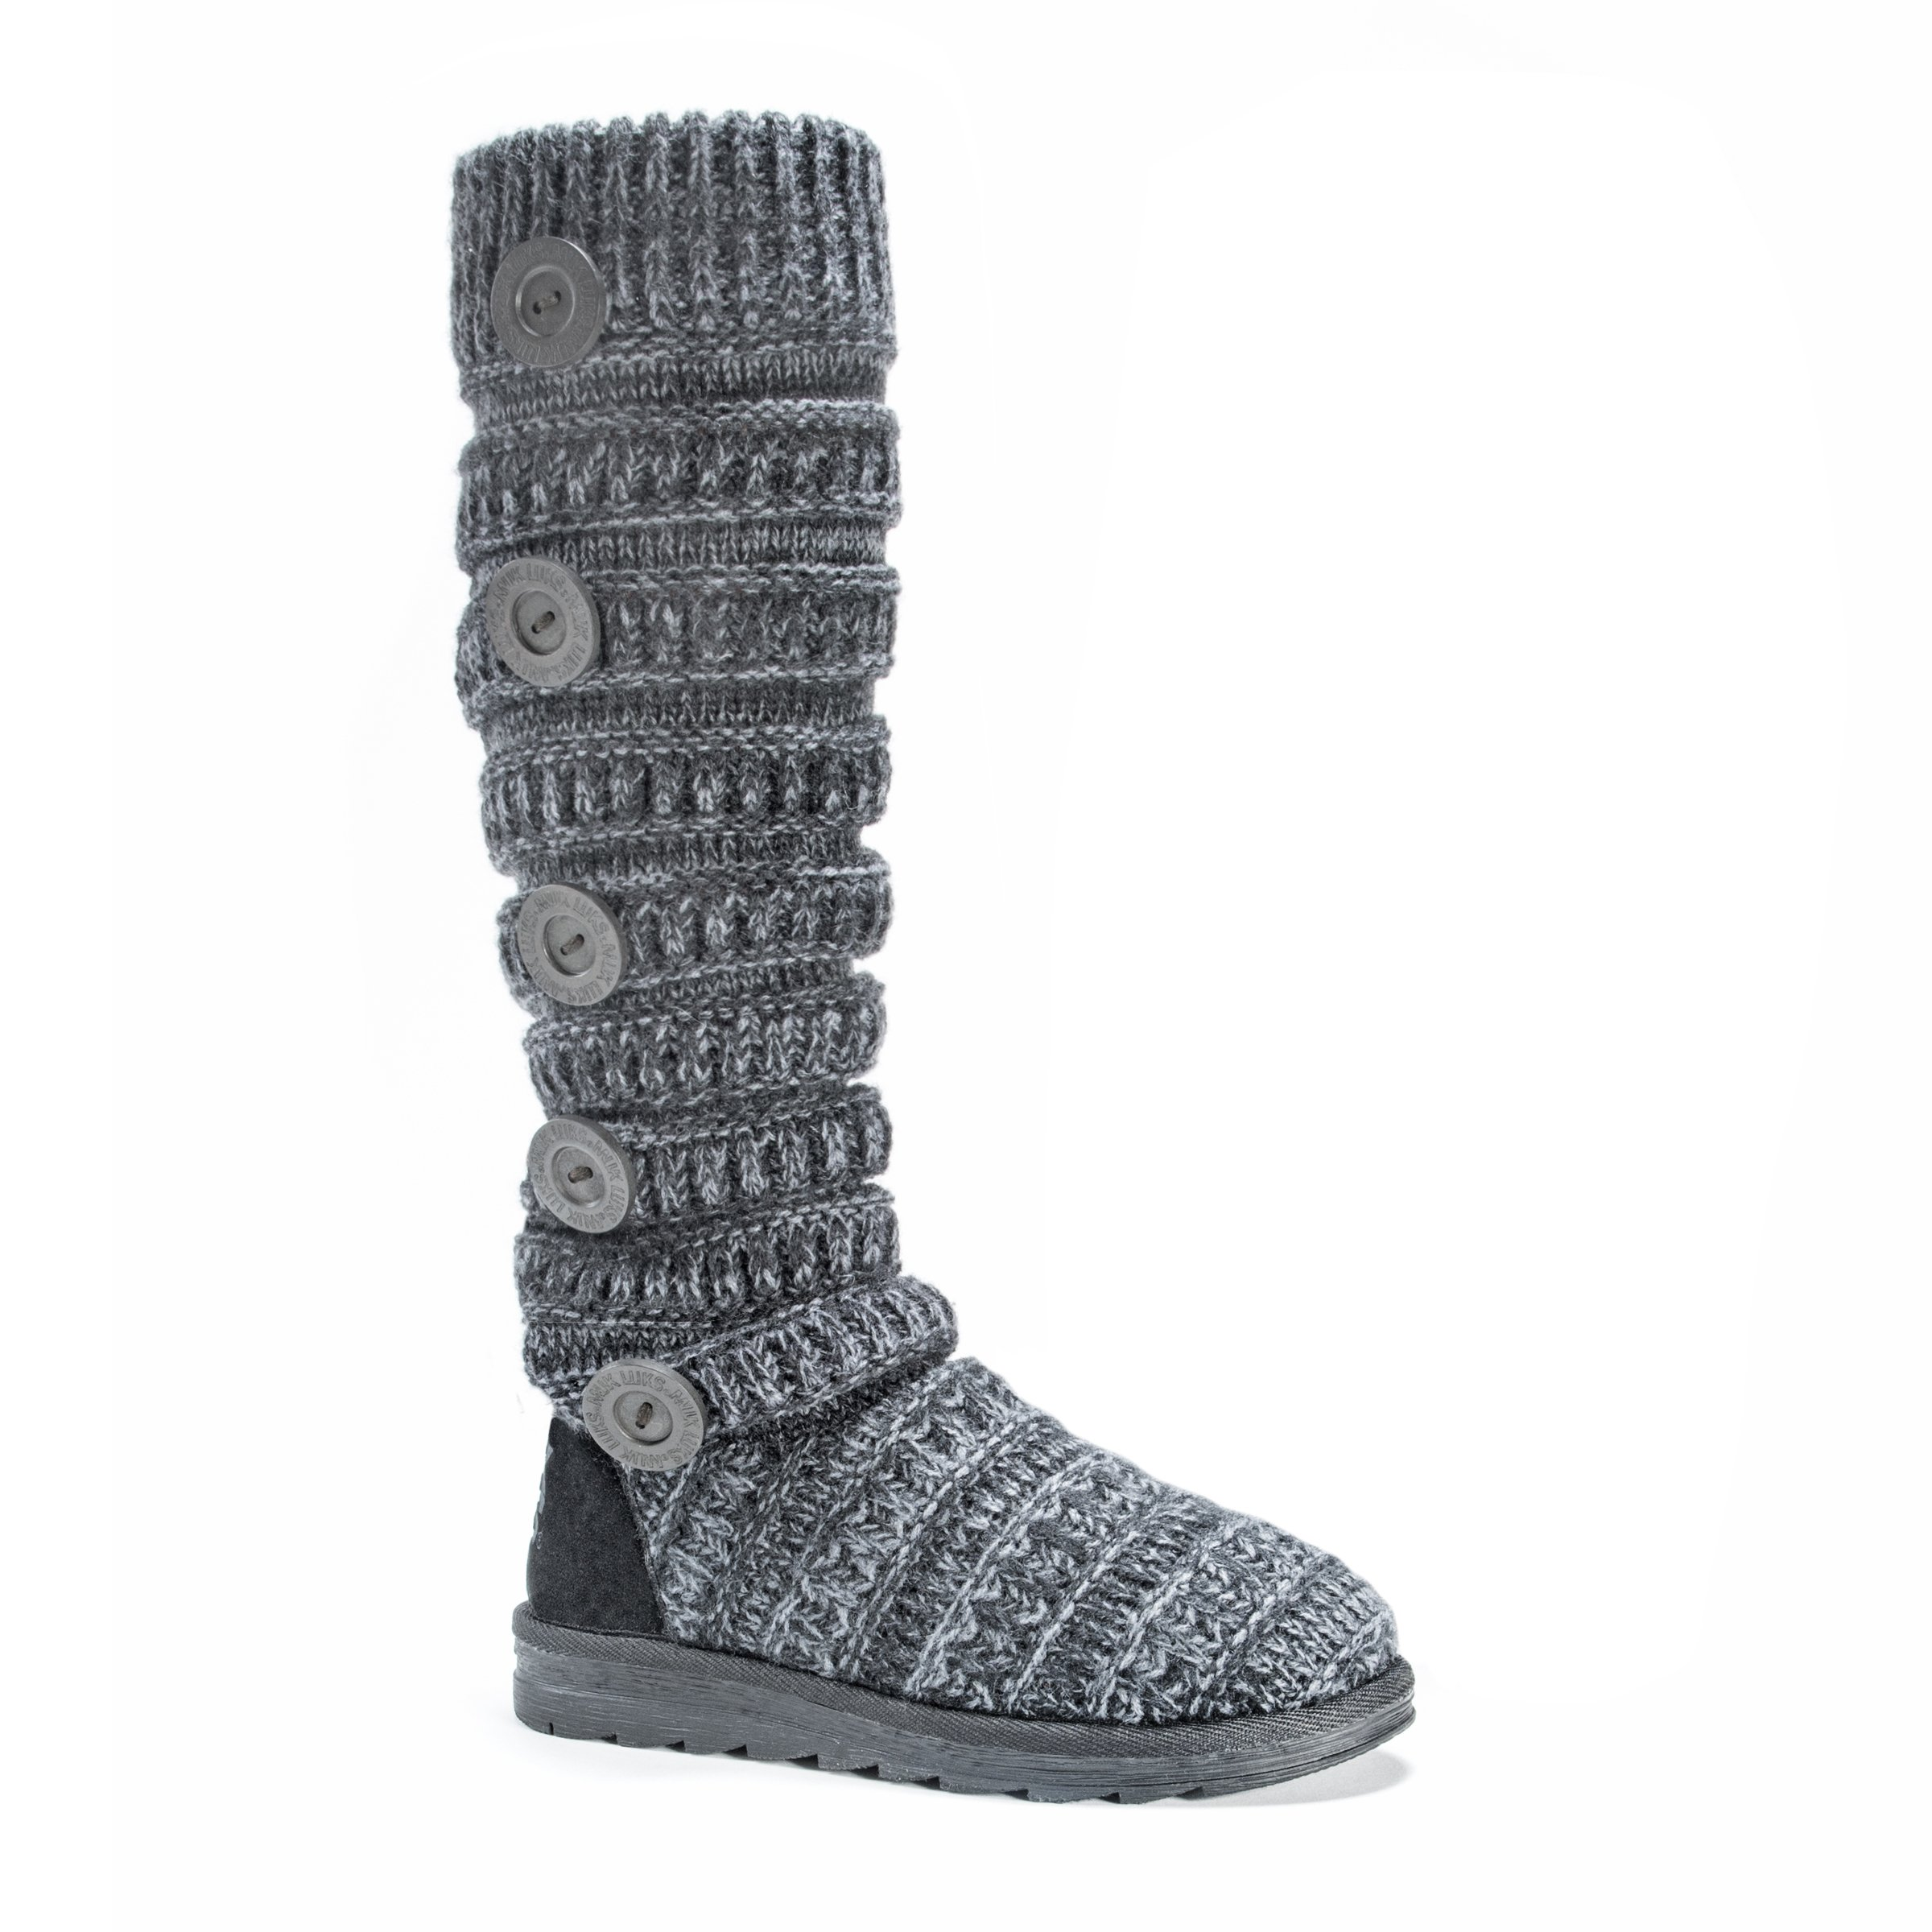 MUK LUKS Women's Miranda Boot Winter, Steel Grey, 7 M US